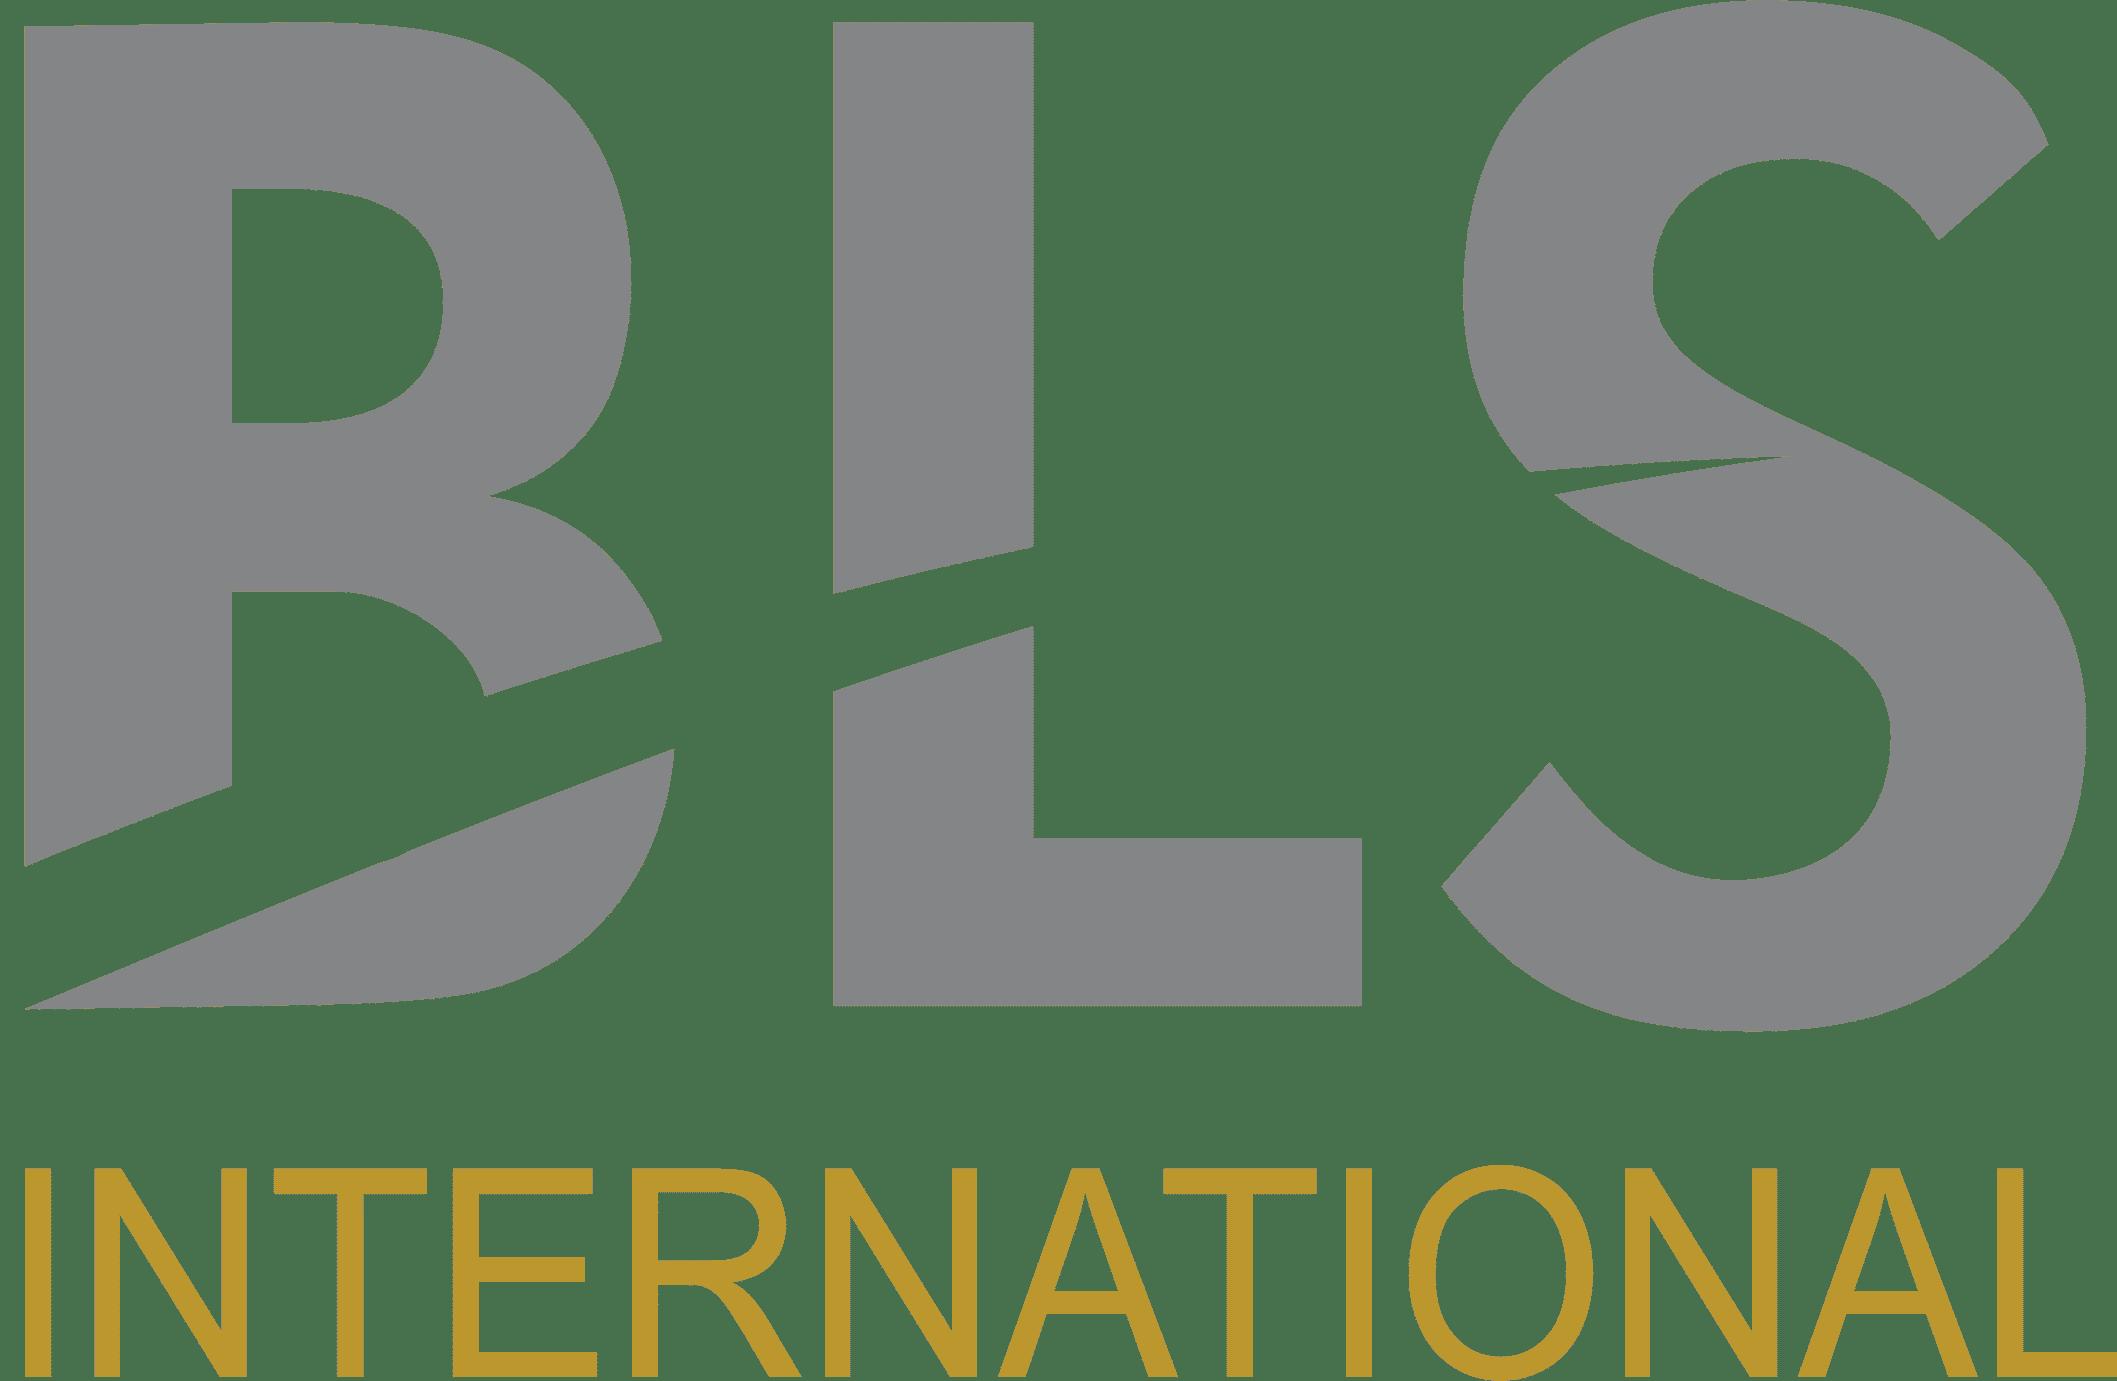 BLS International